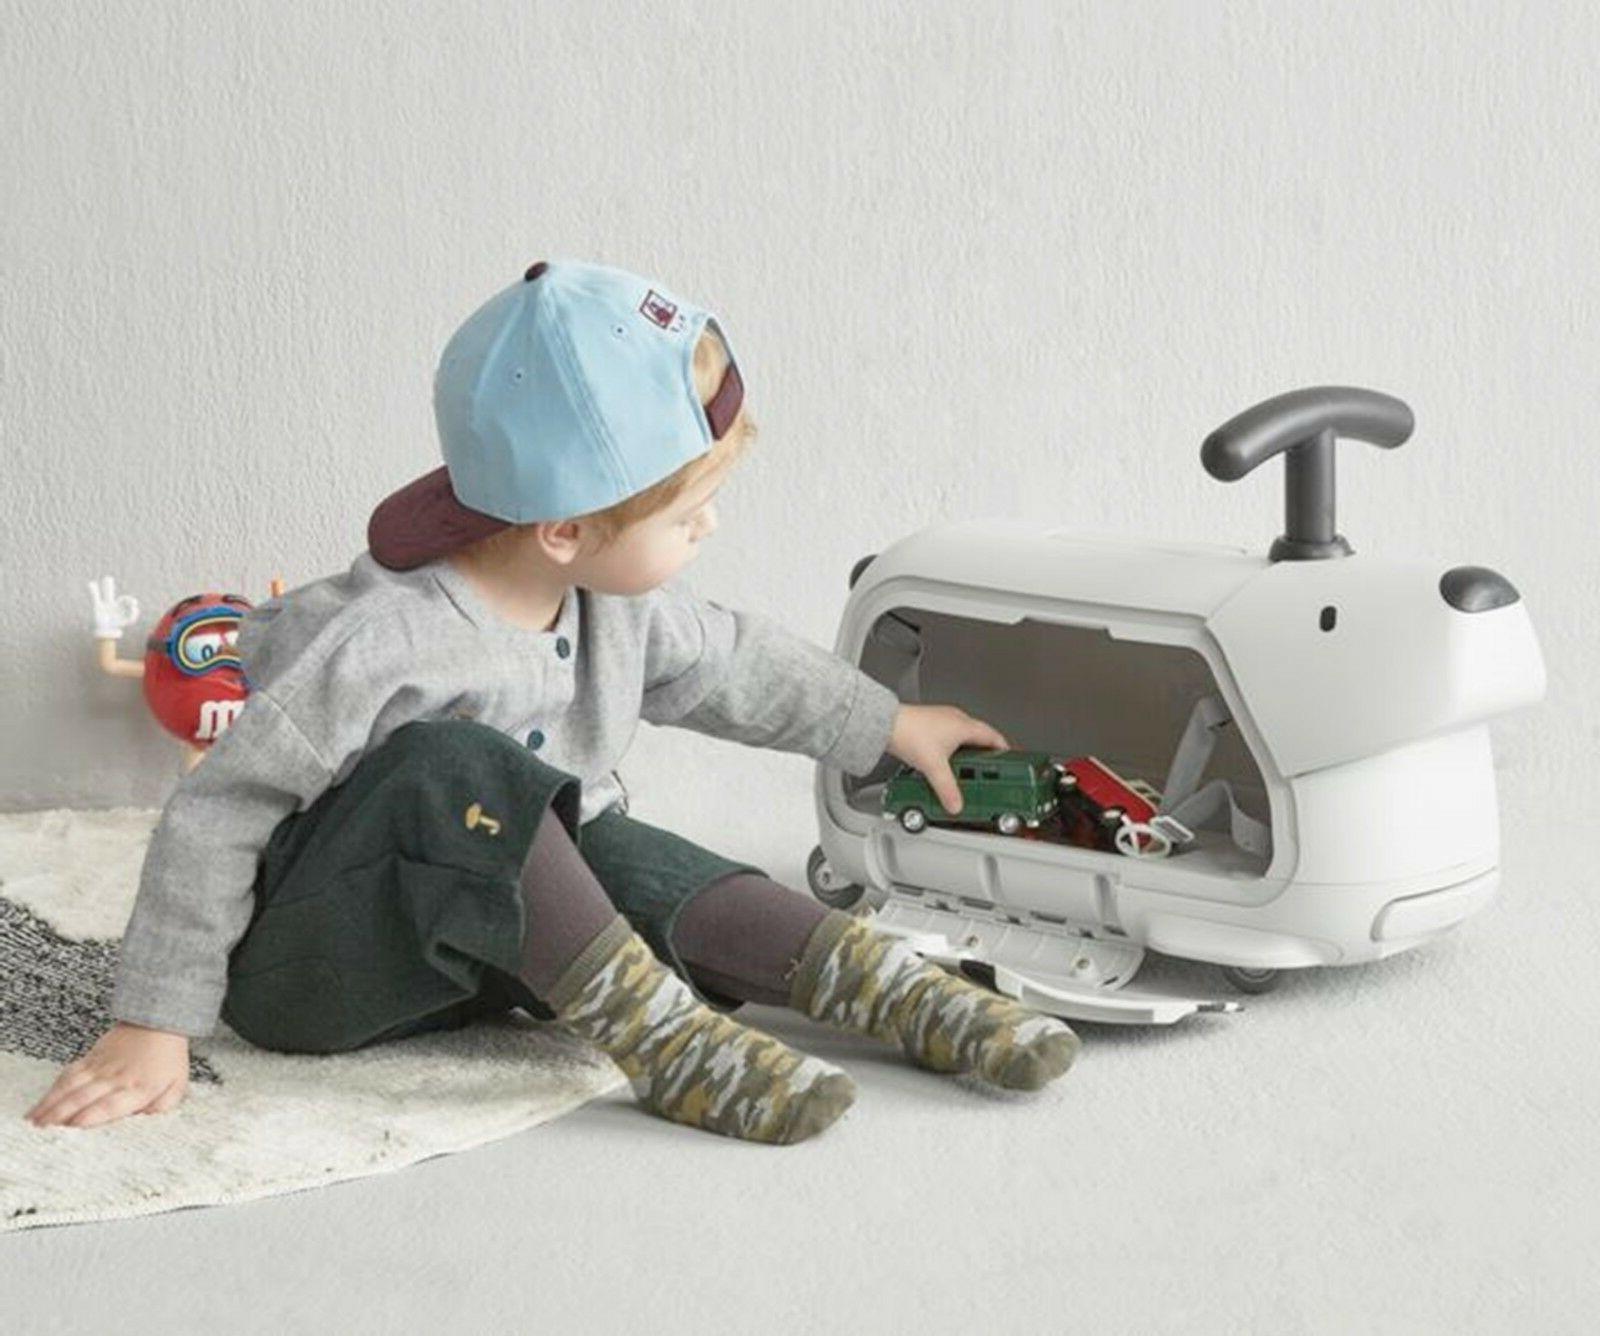 Bontoy TRAVELLER BEAGLE Kids Storage Carrier-Ride Car Toy